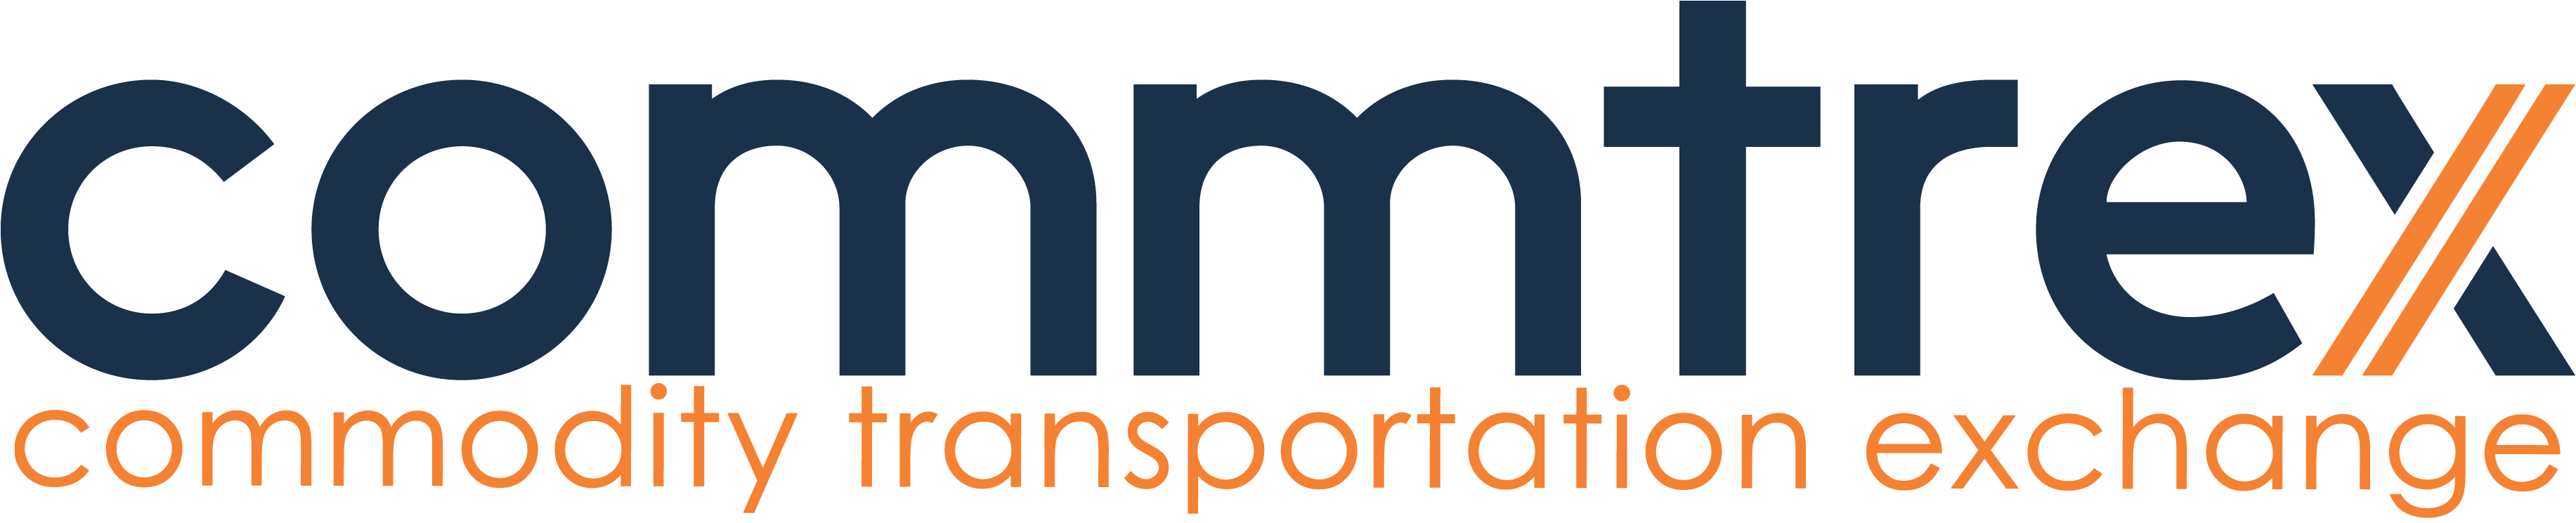 Blue Commtrex Tagline Logo (Transparent Background)